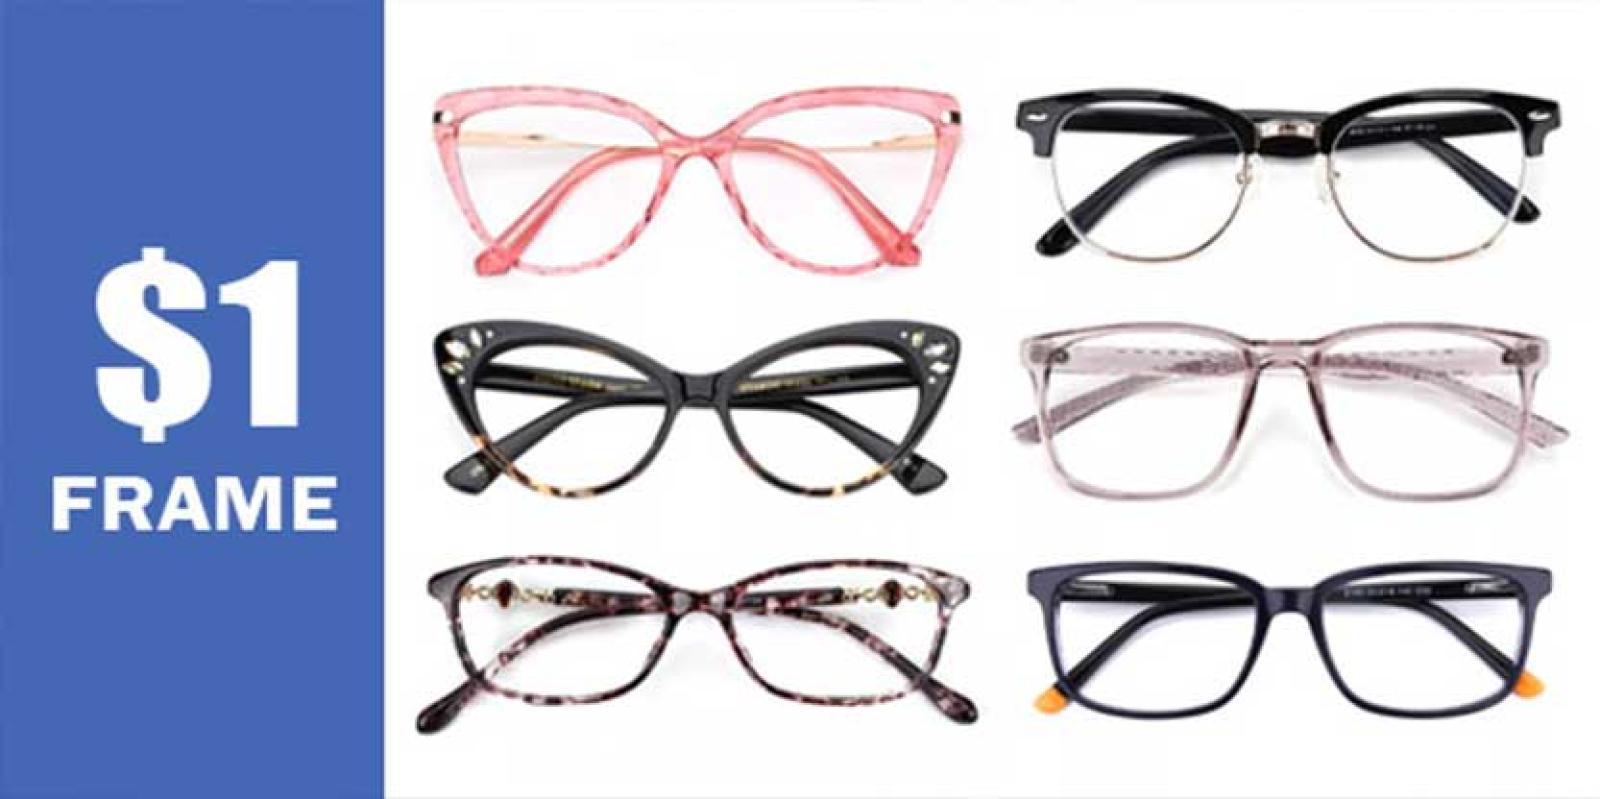 1.59 Polycarbonate Impact Resistant-Translucent---Eyeglasses-additional3